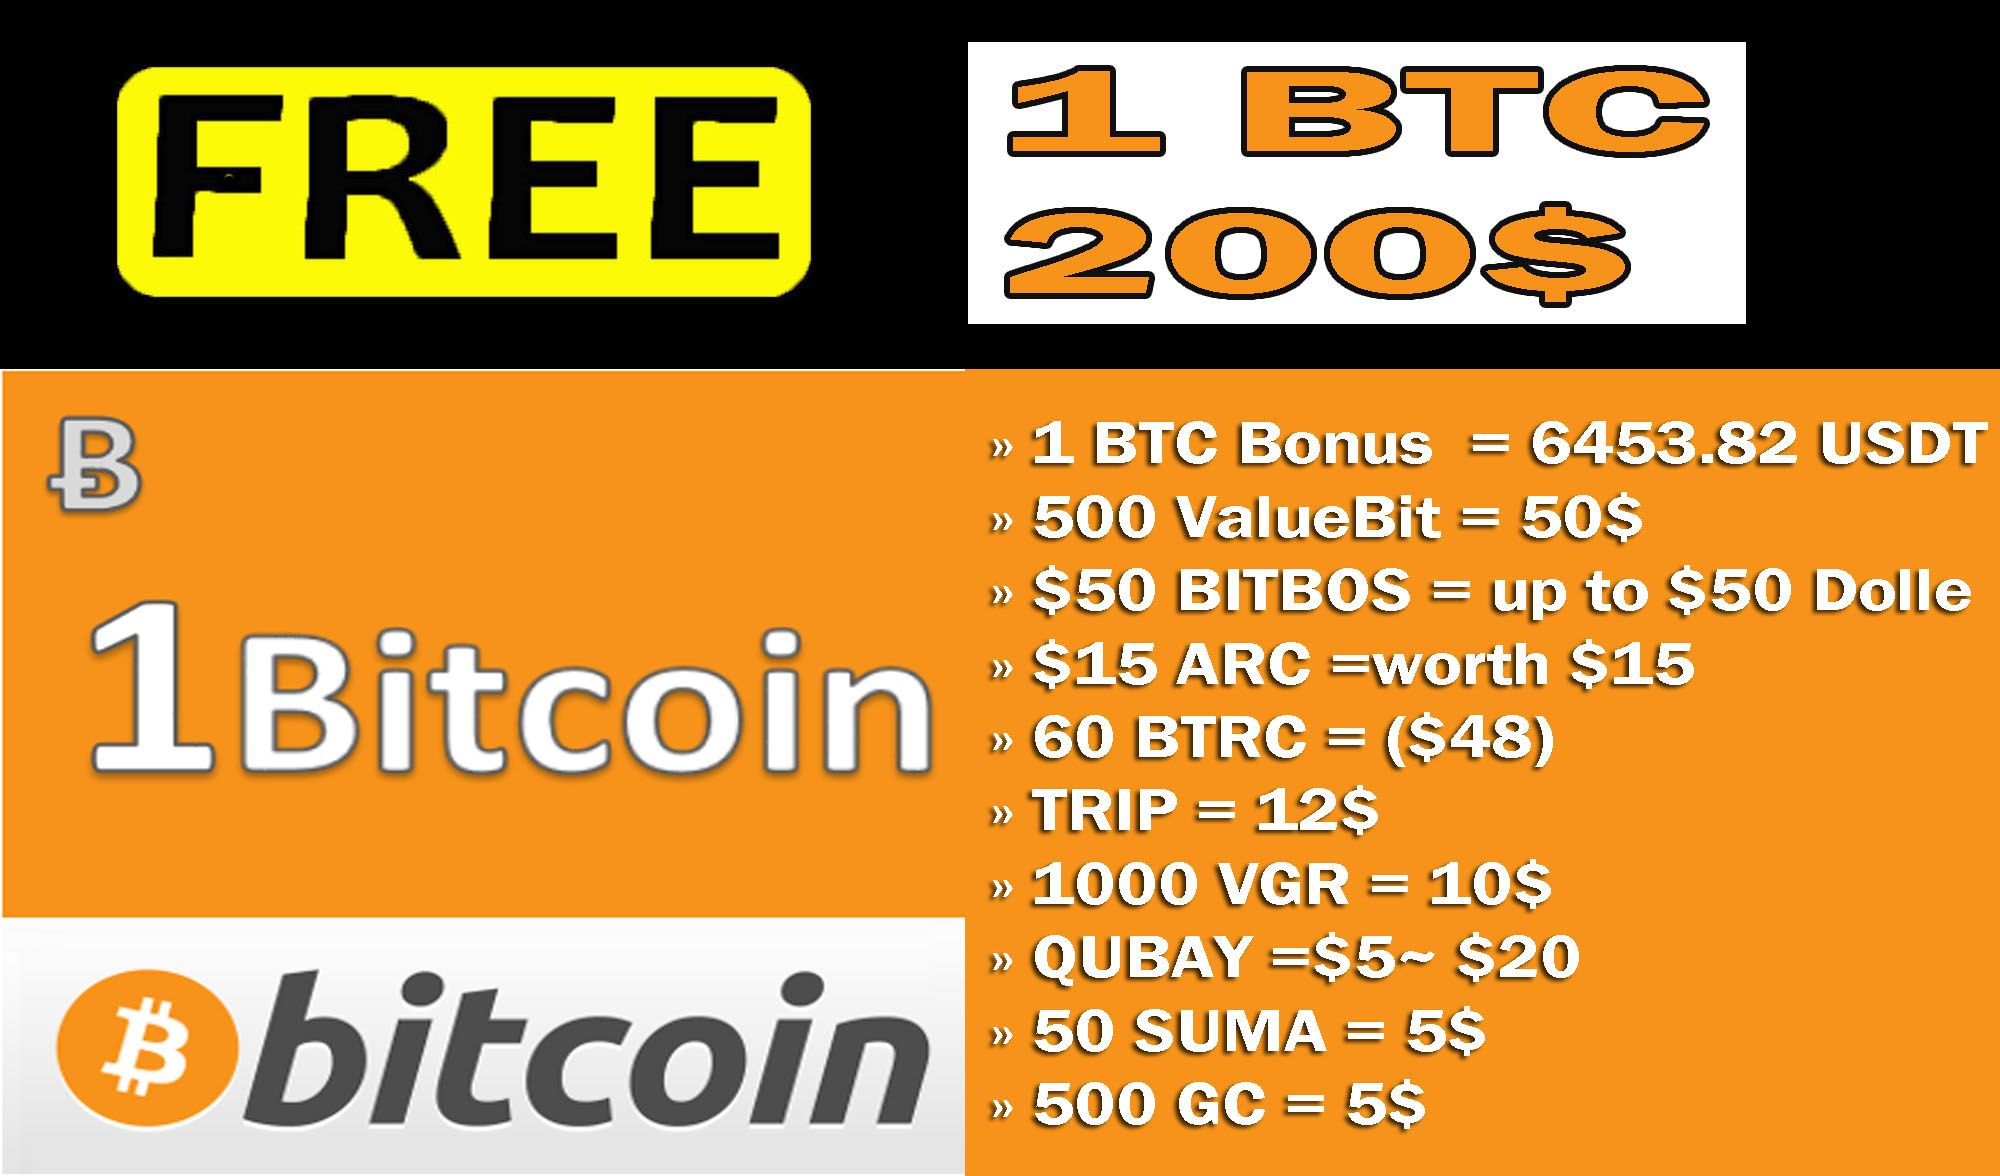 free 1 BTC / 6453 82 USDT + free 200$ + Free coins exchange